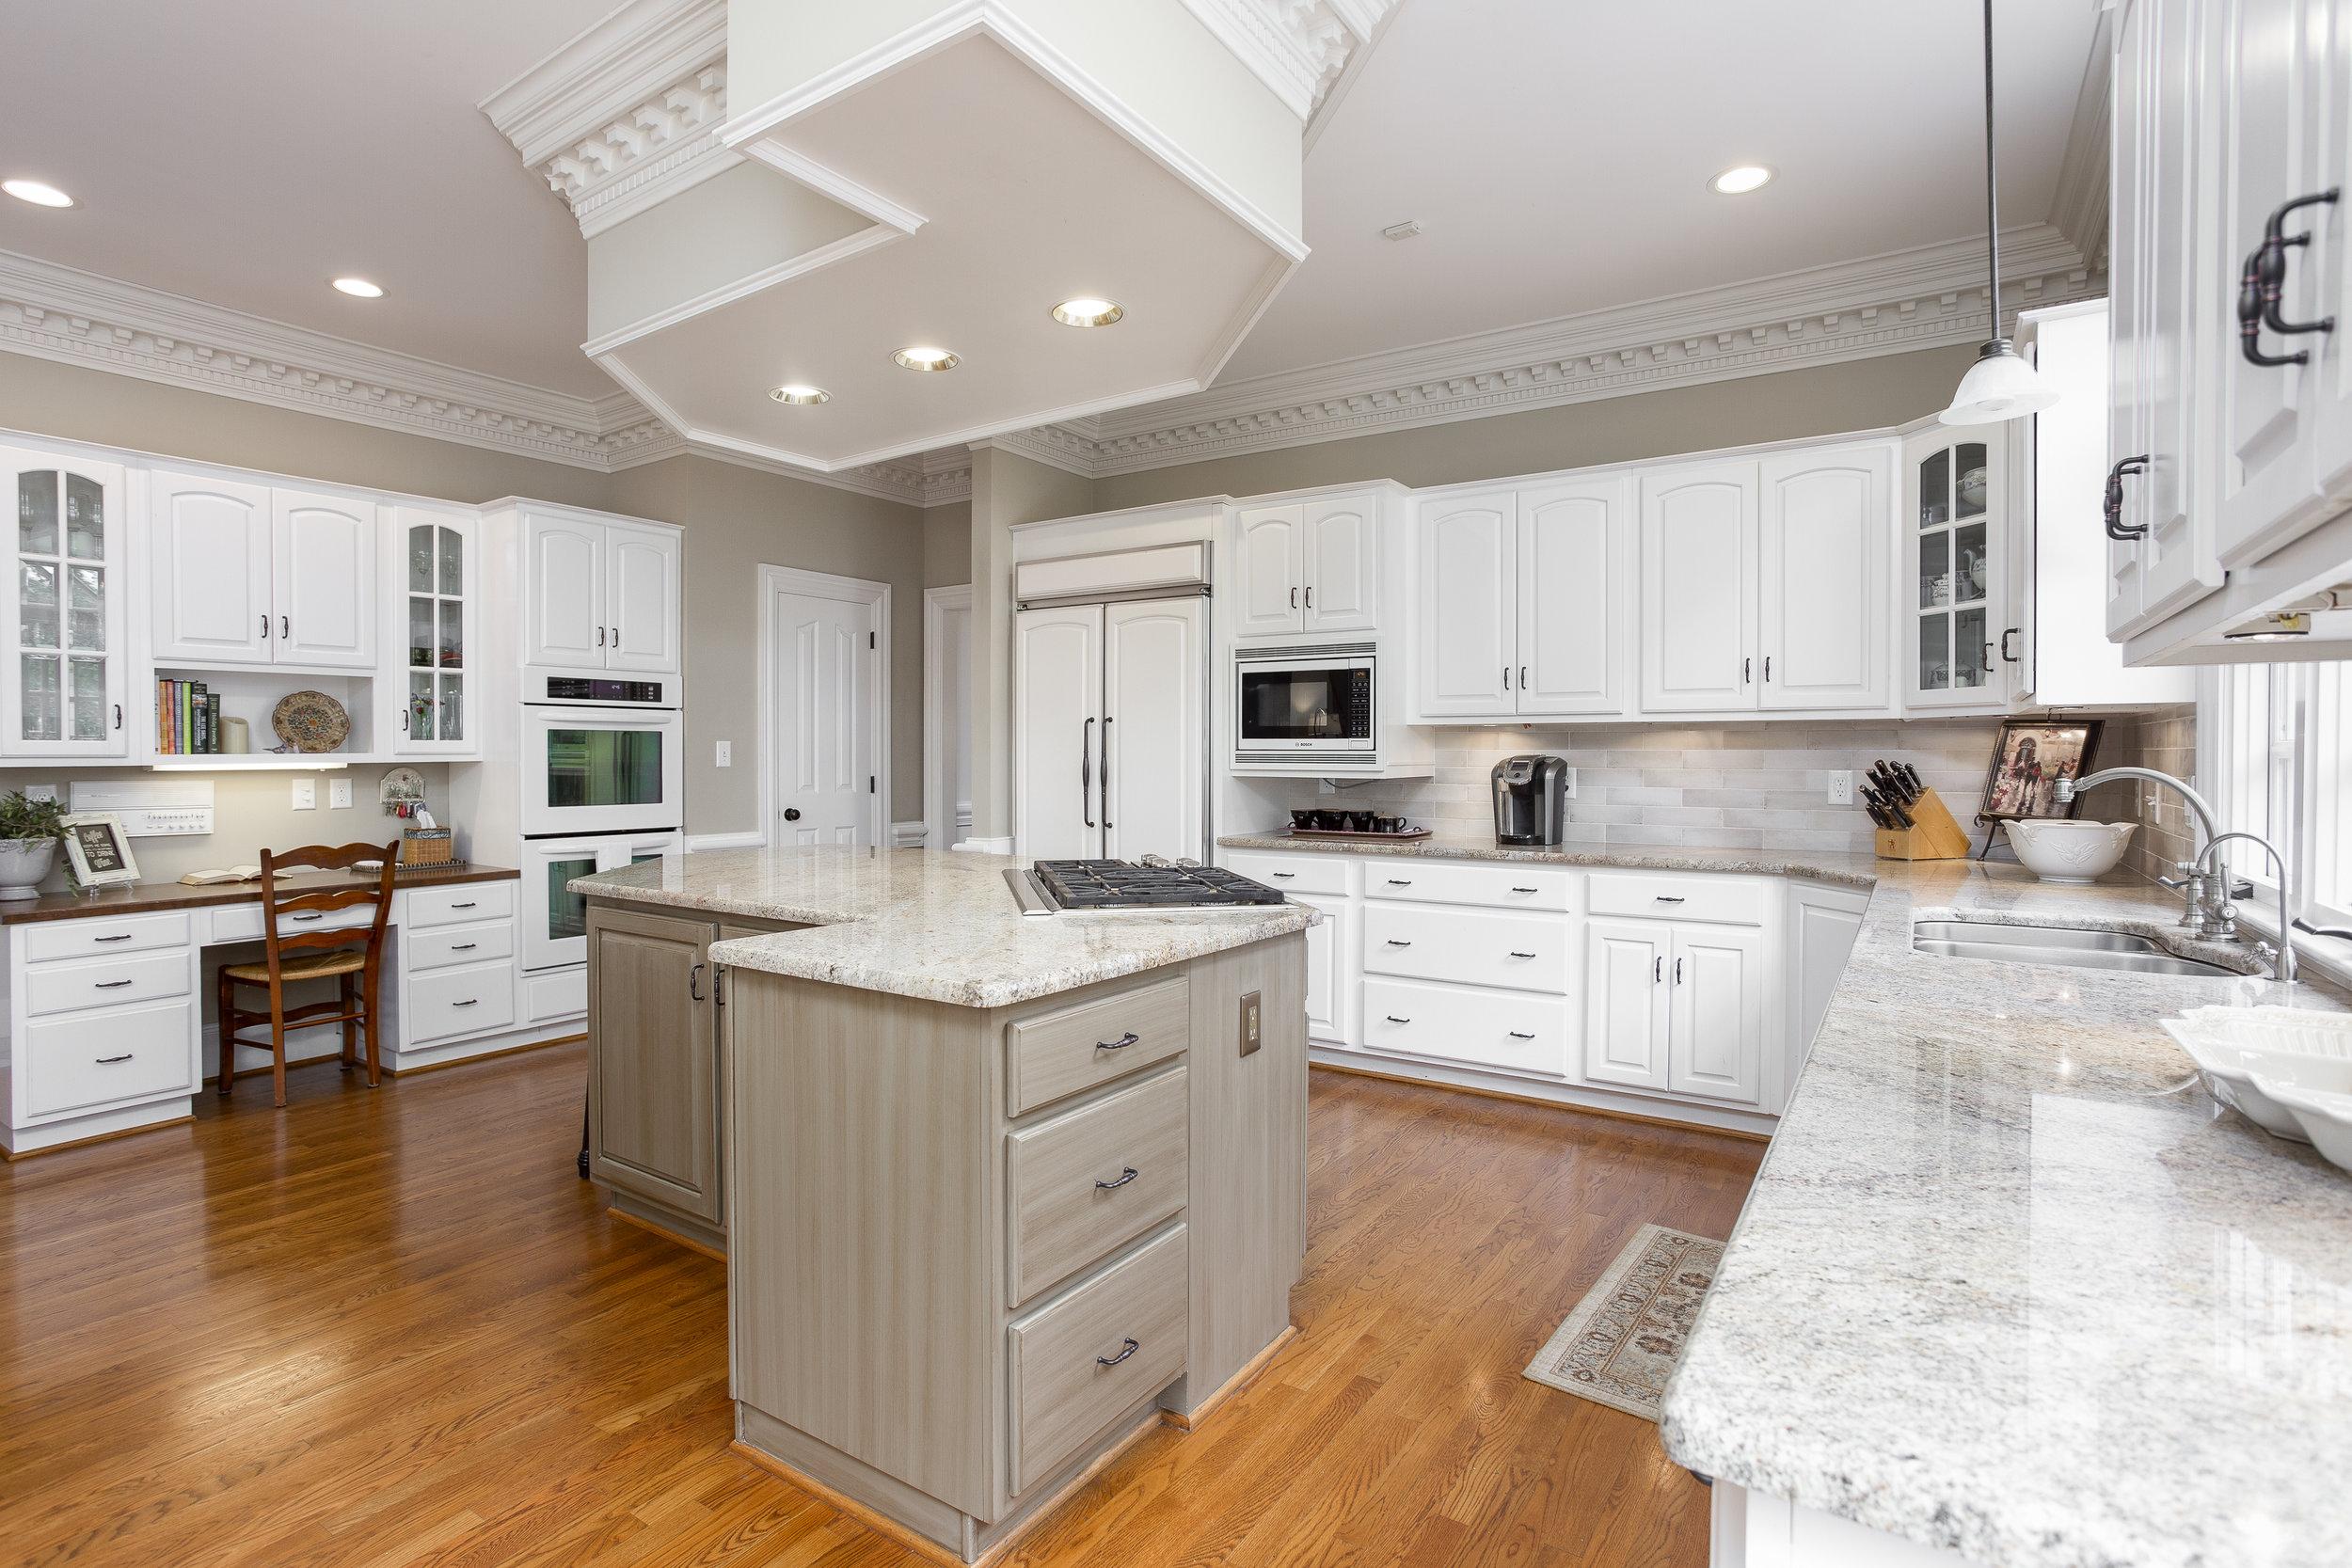 triad-real-estate-photography-drone-aerial-photographer-realtor-high-point-greensboro-kernersville-burlington07.jpg